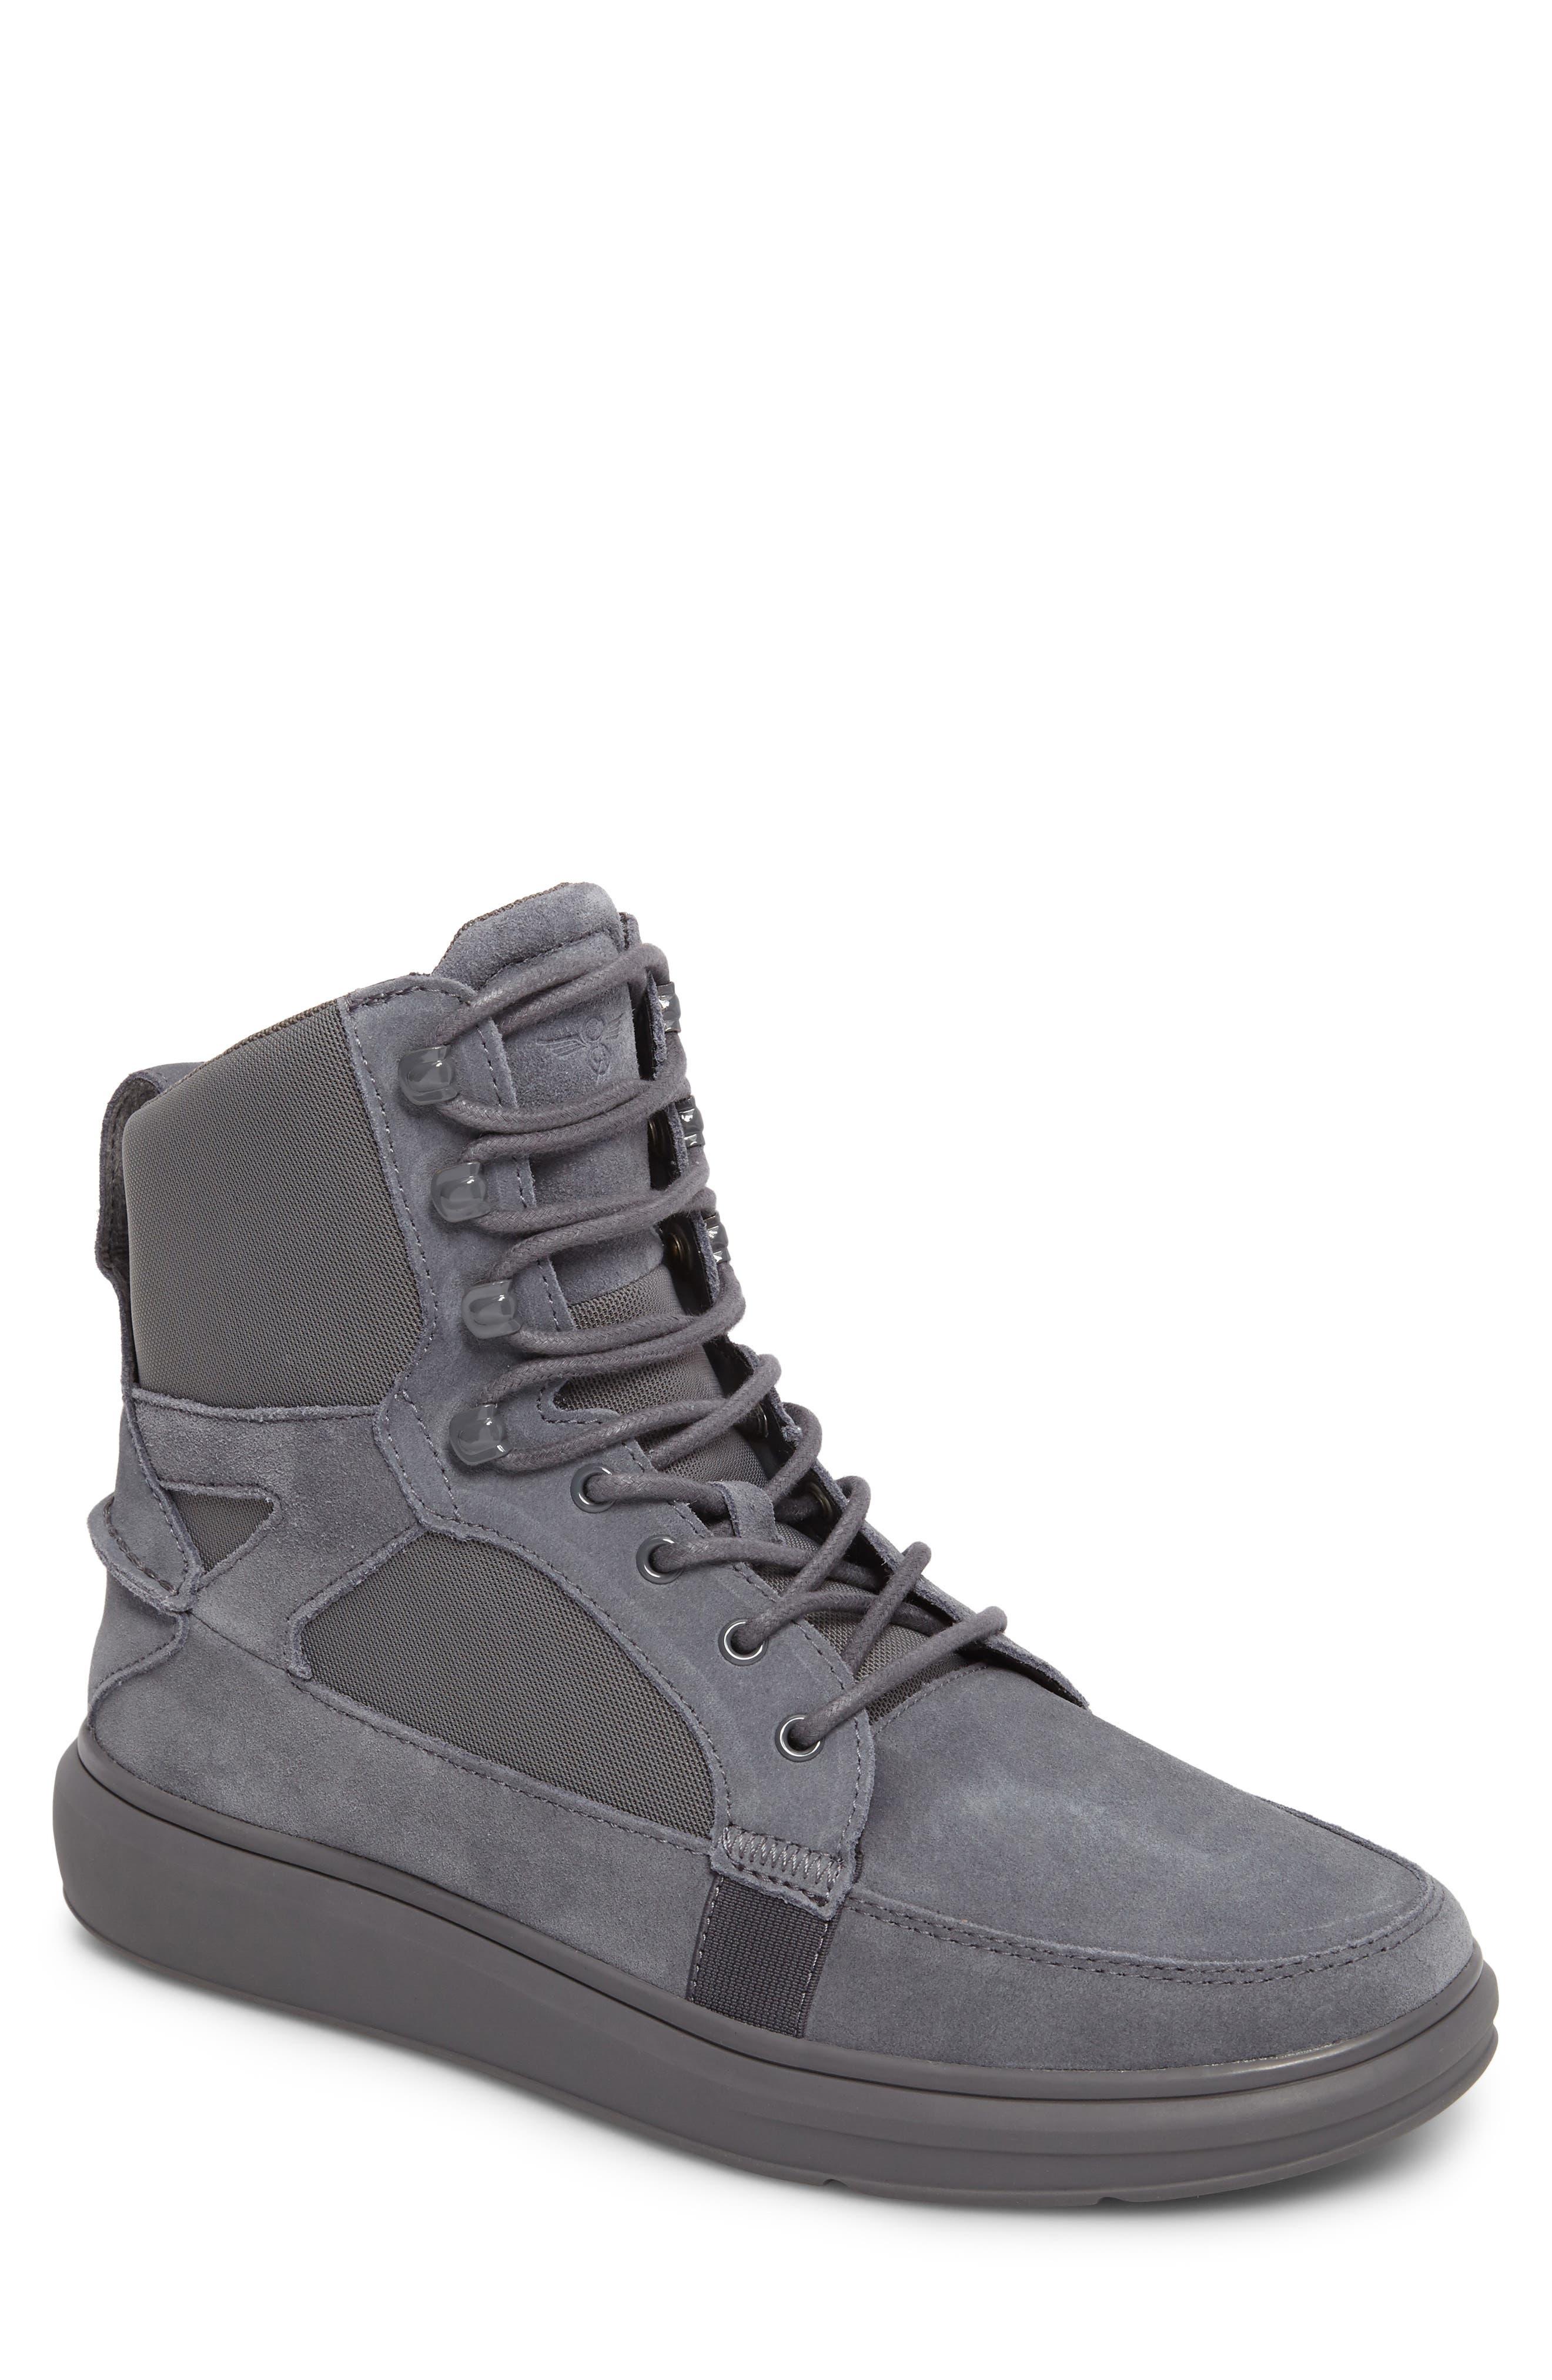 Desimo Sneaker,                         Main,                         color, 032